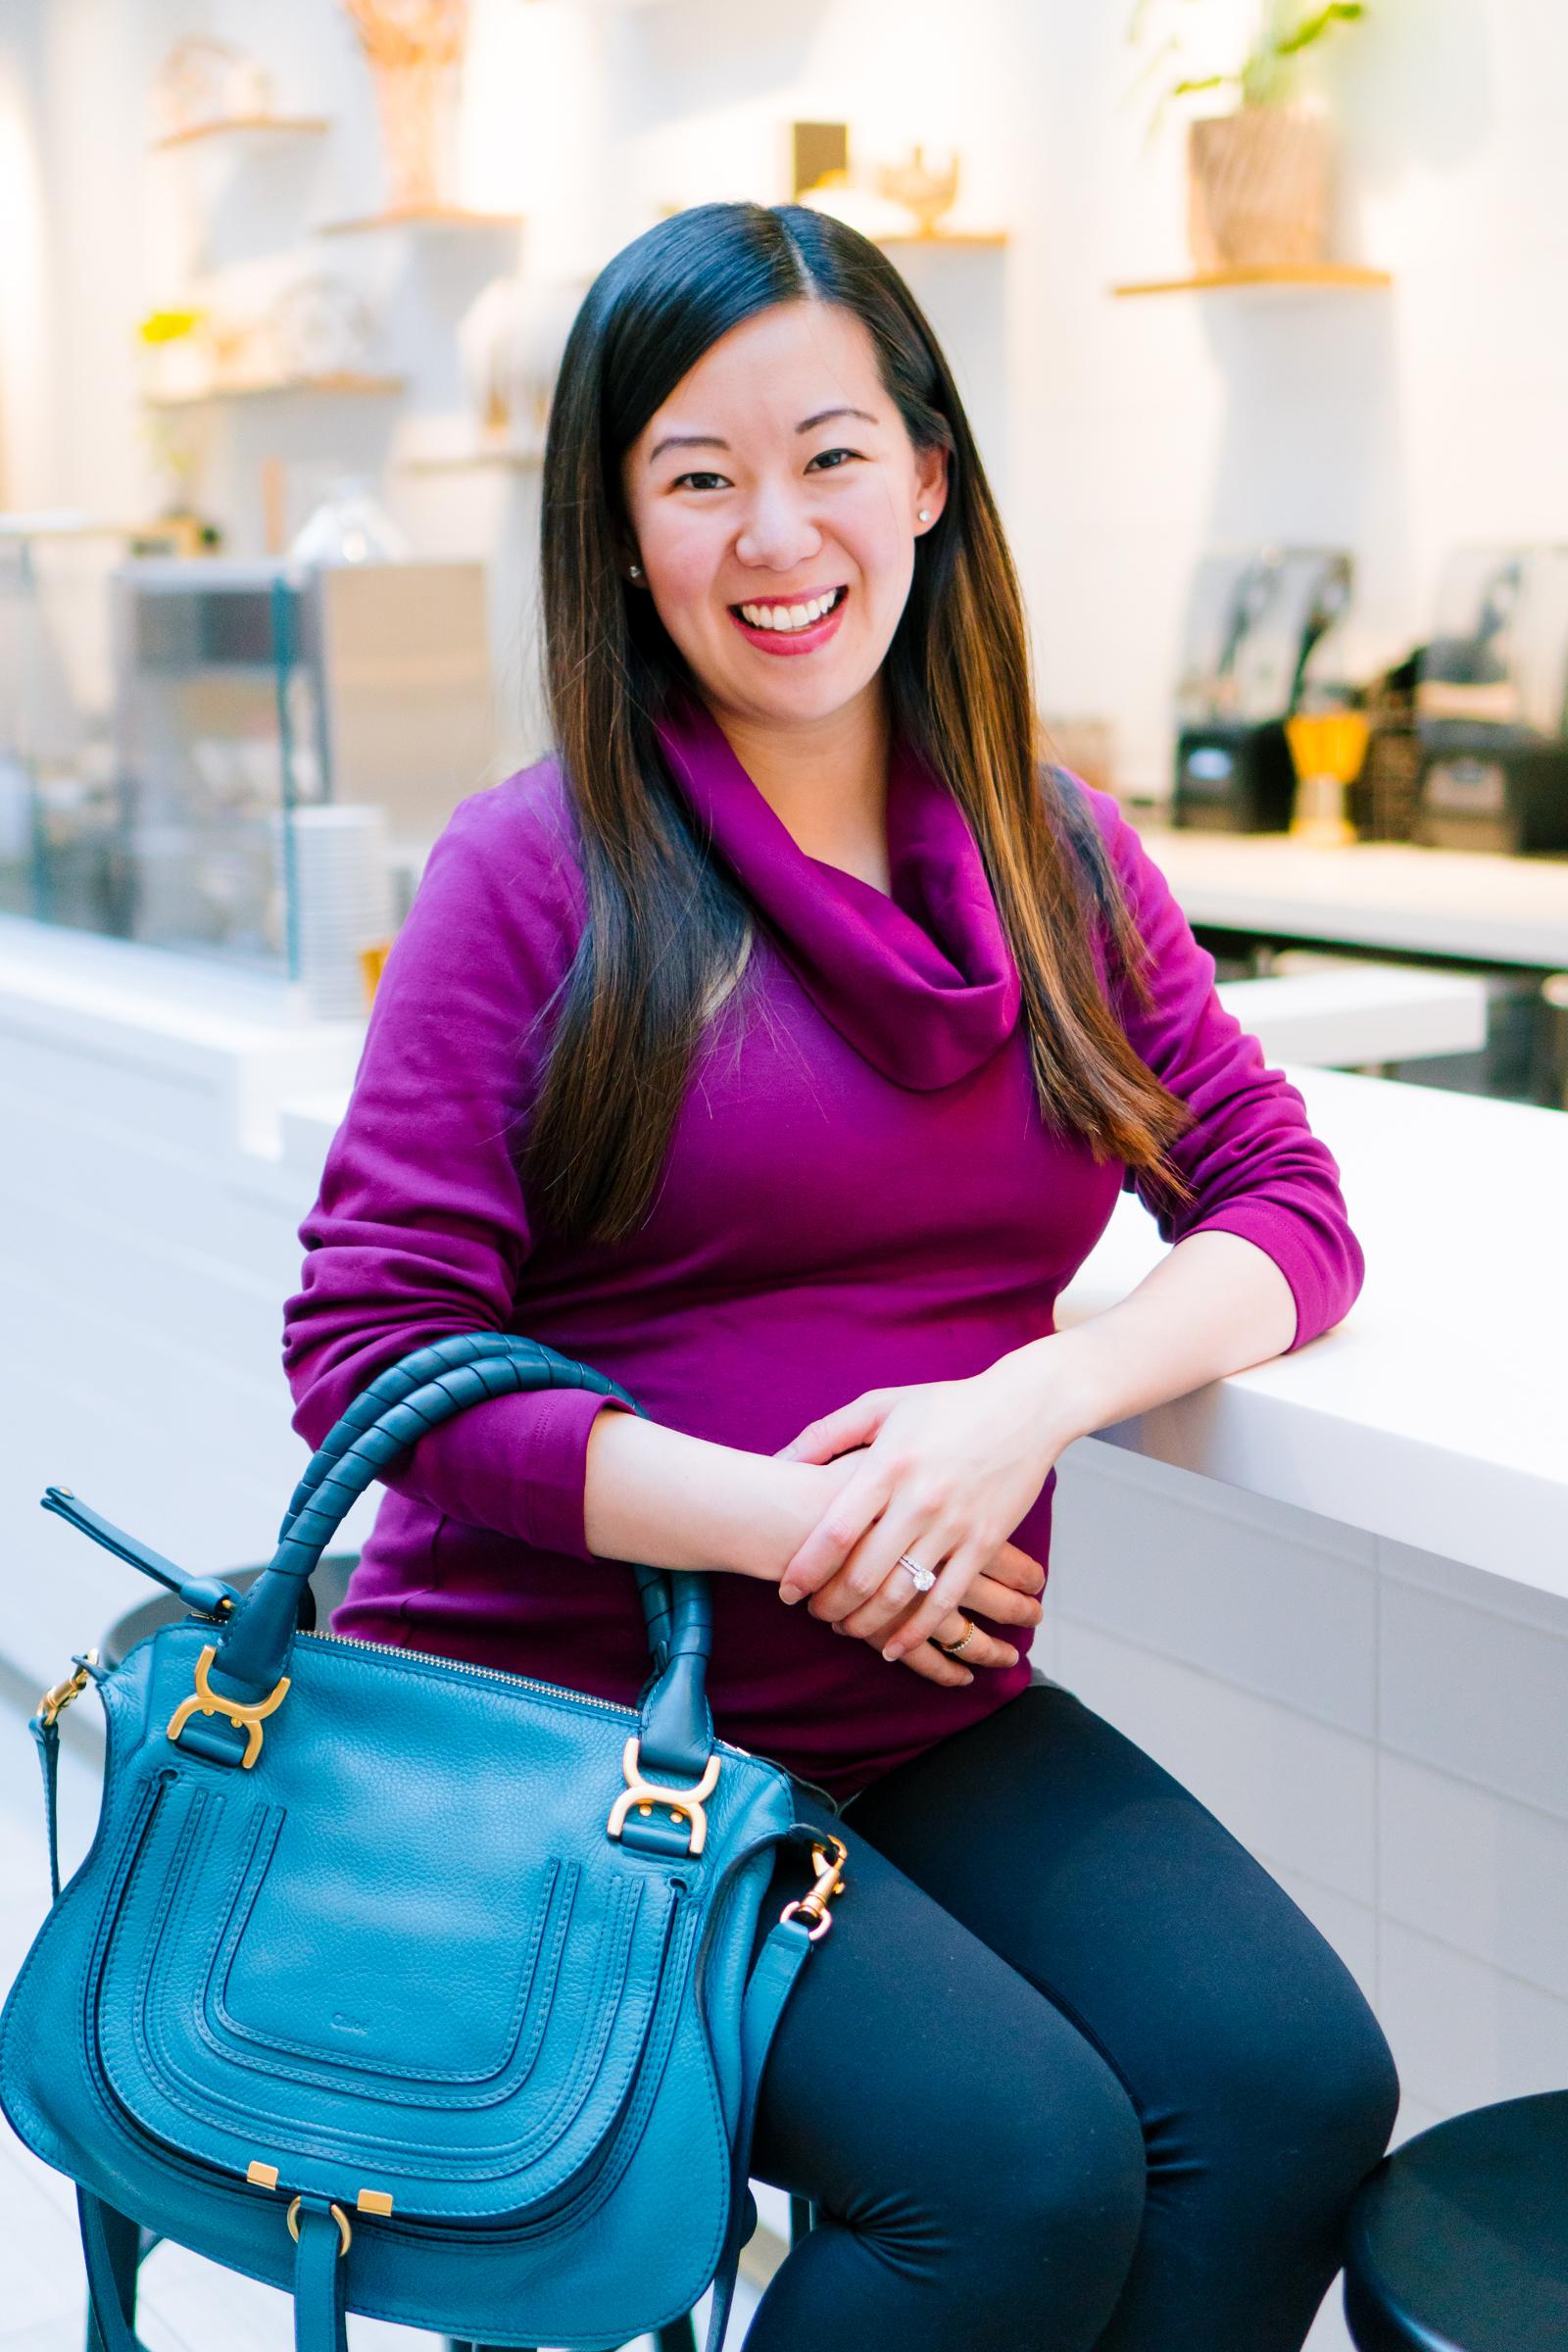 Organic Cotton Cowl Neck Top and Chloe Marcie Handbag, Tia Perciballi Fashion & Lifestyle Blog